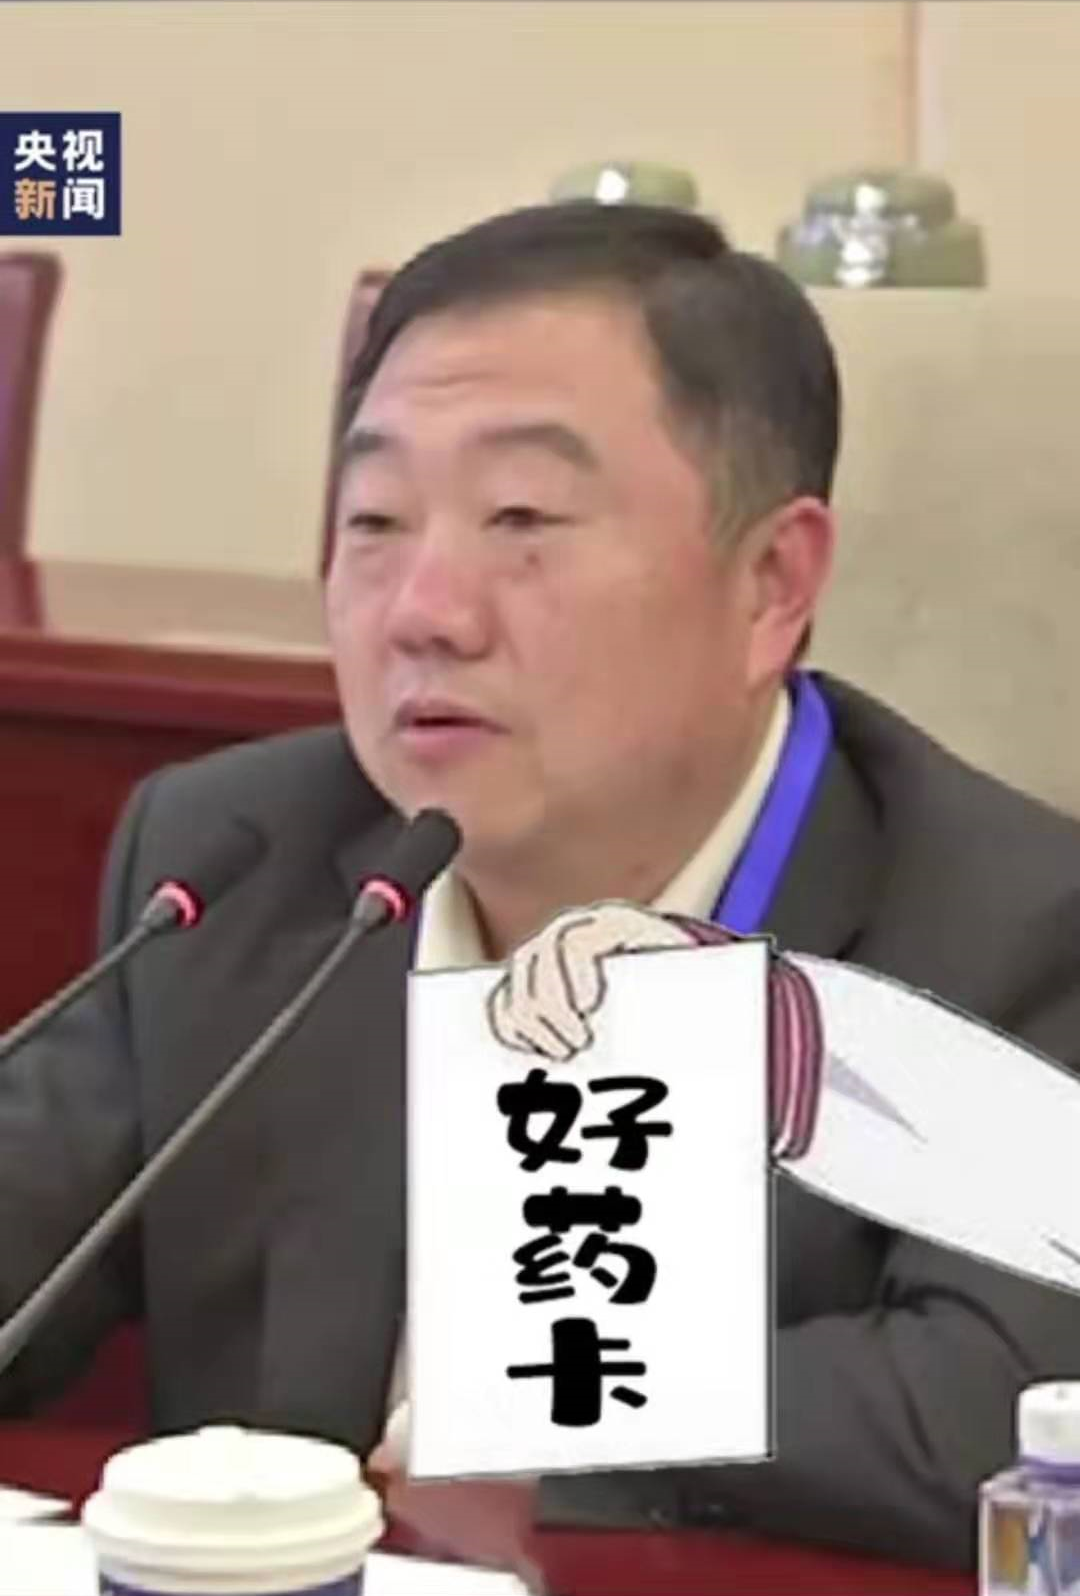 ag亚游登录不上去怎么回事_陇南成县东河生态景观二期工程施工监理中标公示